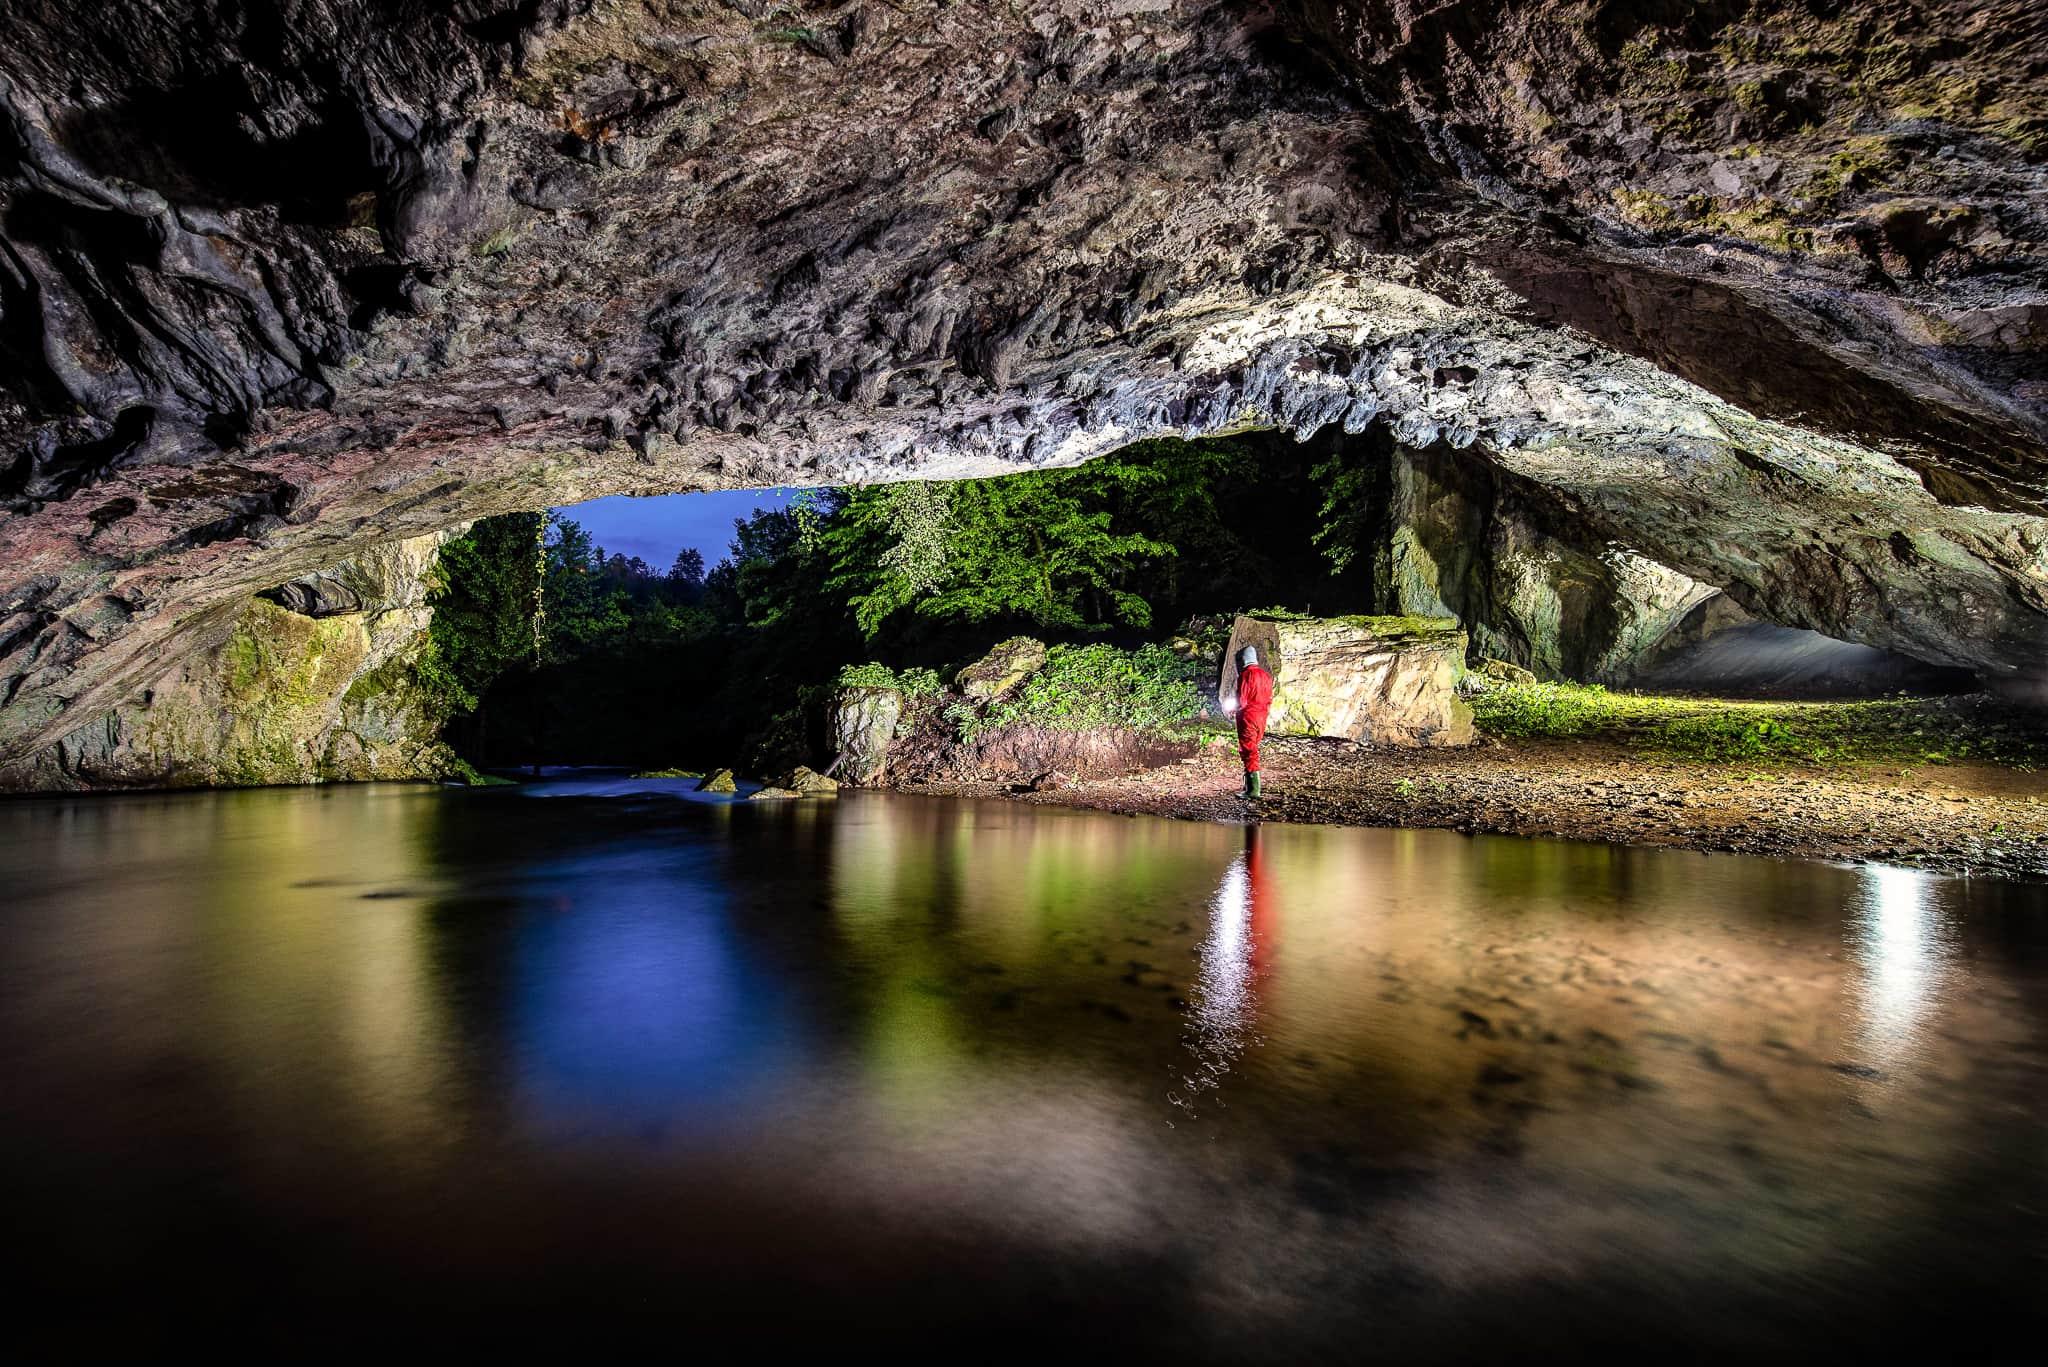 Roman Martin-Caves photography